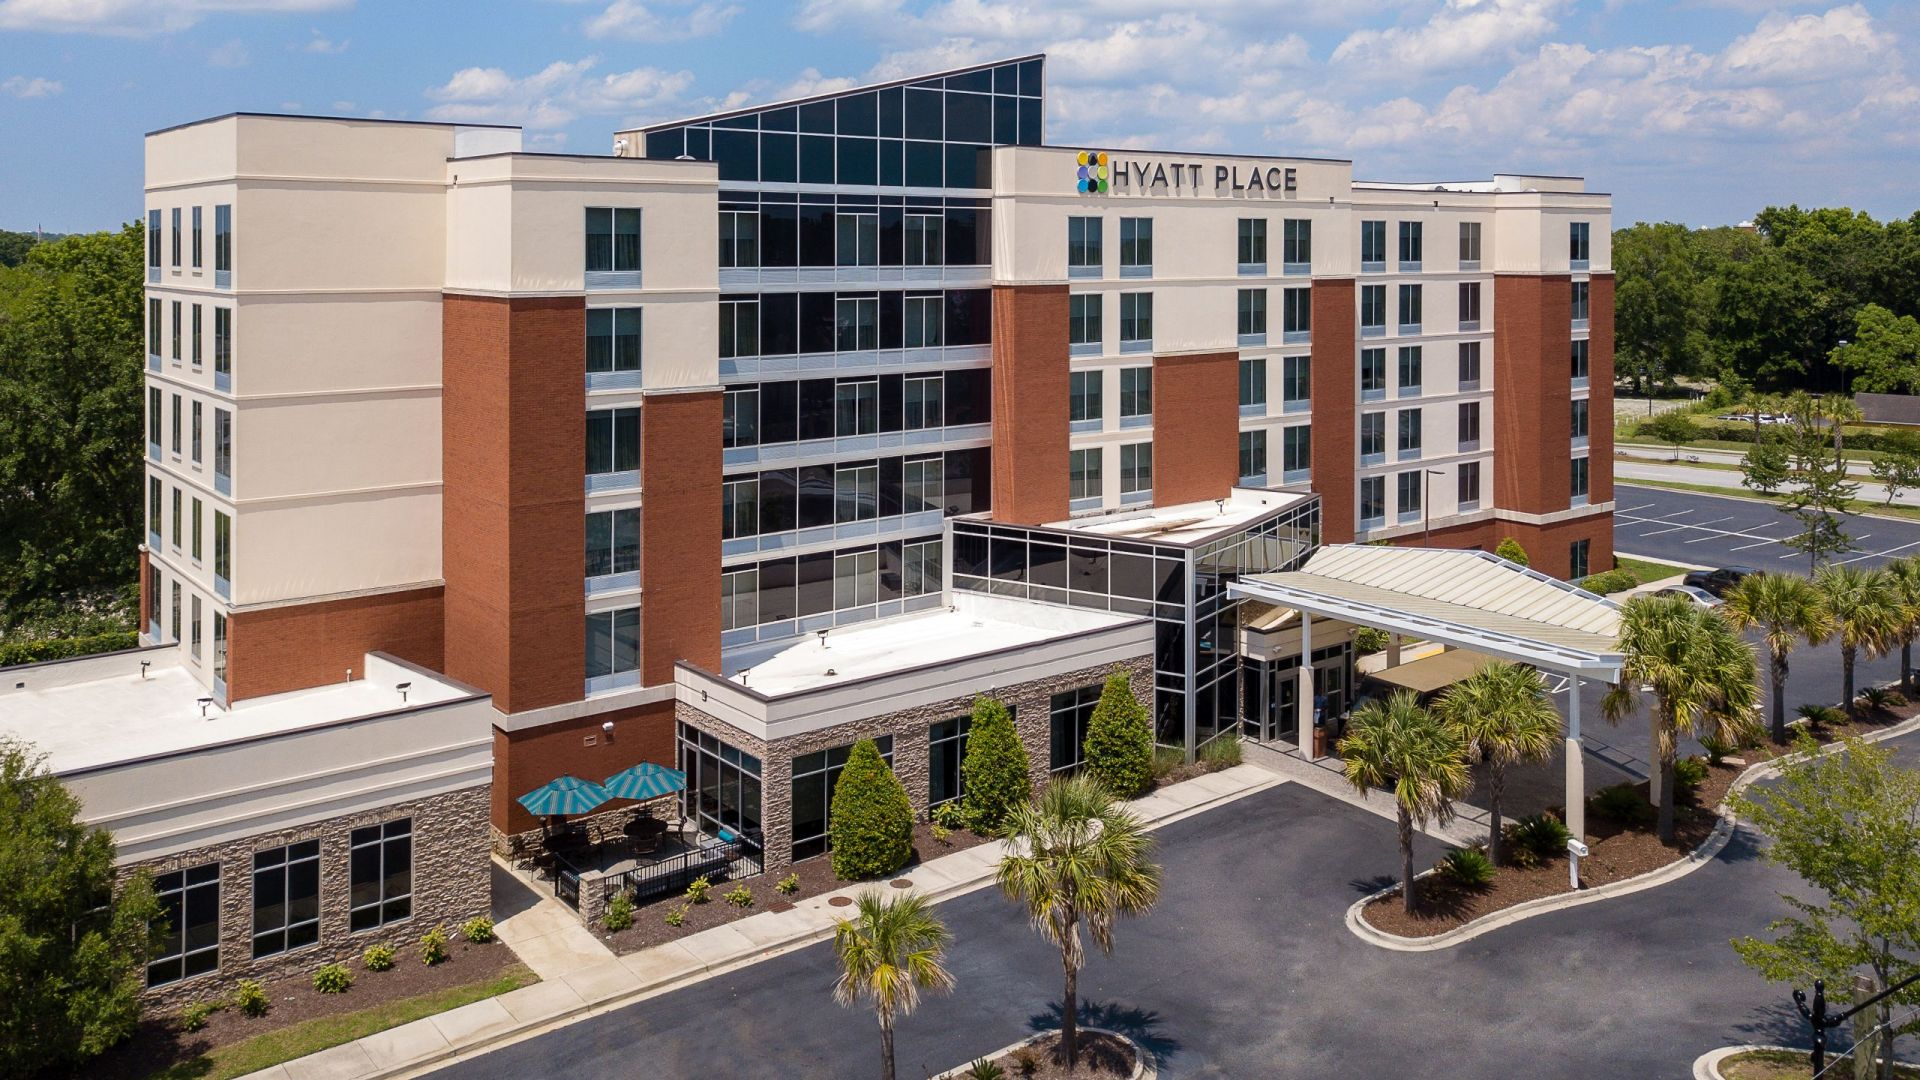 Hyatt Place Charleston Convention/Airport Hotel exterior